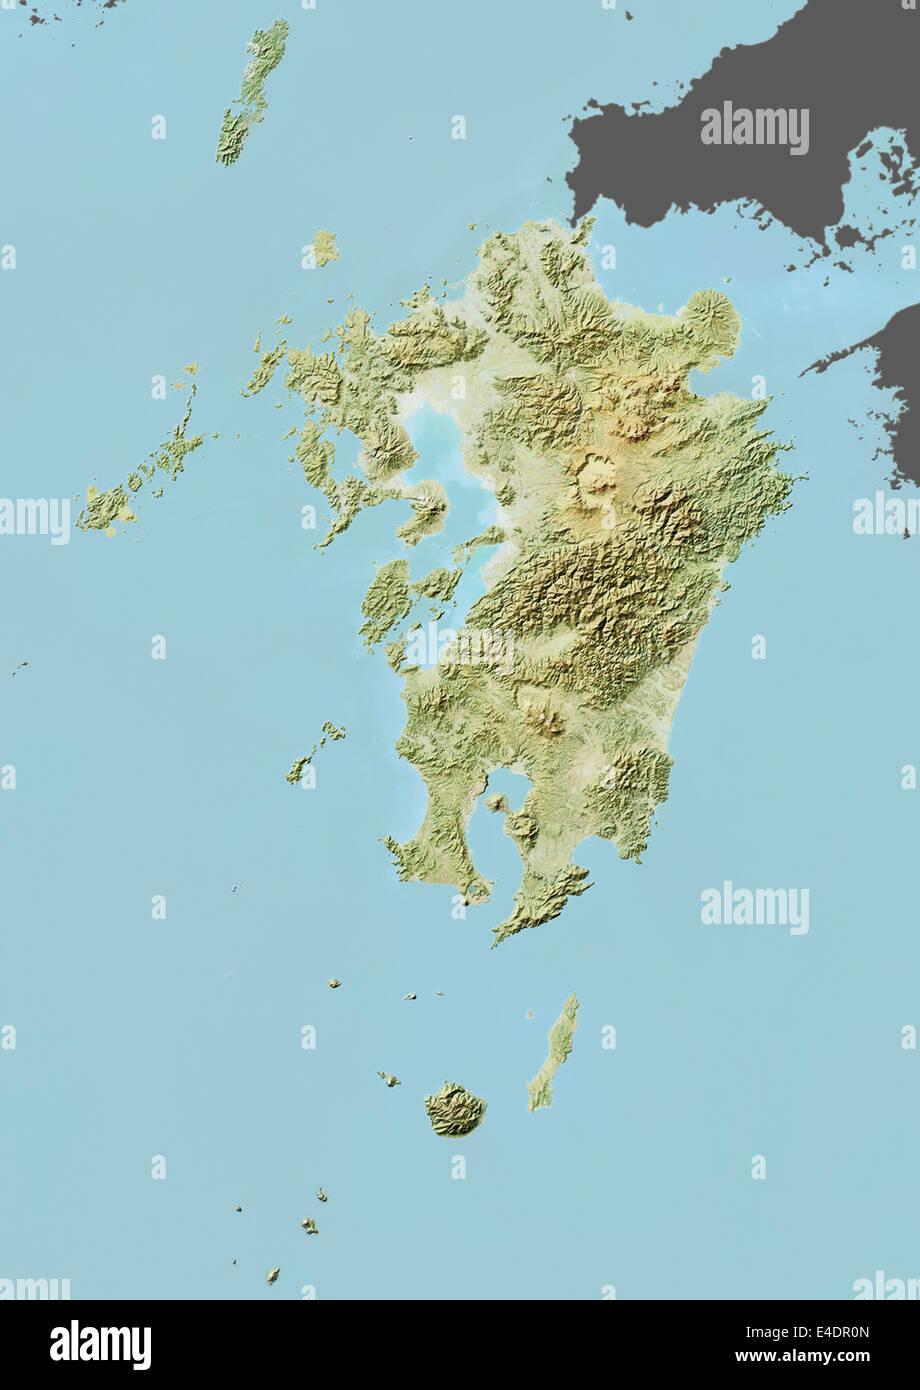 Region Of Kyushu Japan Relief Map Stock Photo Royalty Free - Japan map kyushu